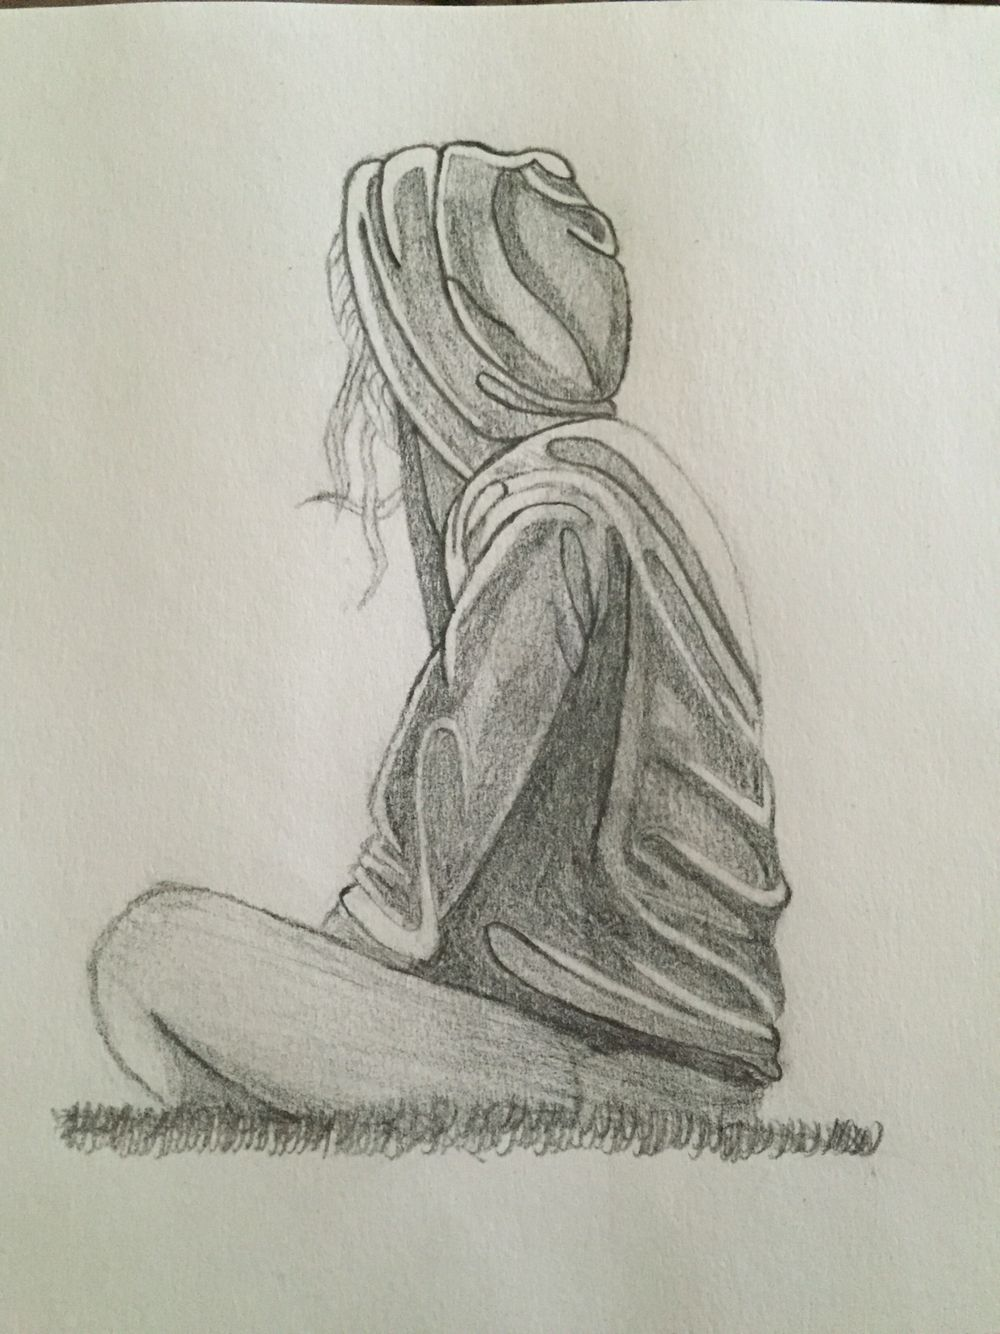 Aesthetic Girl Drawing Wallpapers , Top Free Aesthetic Girl